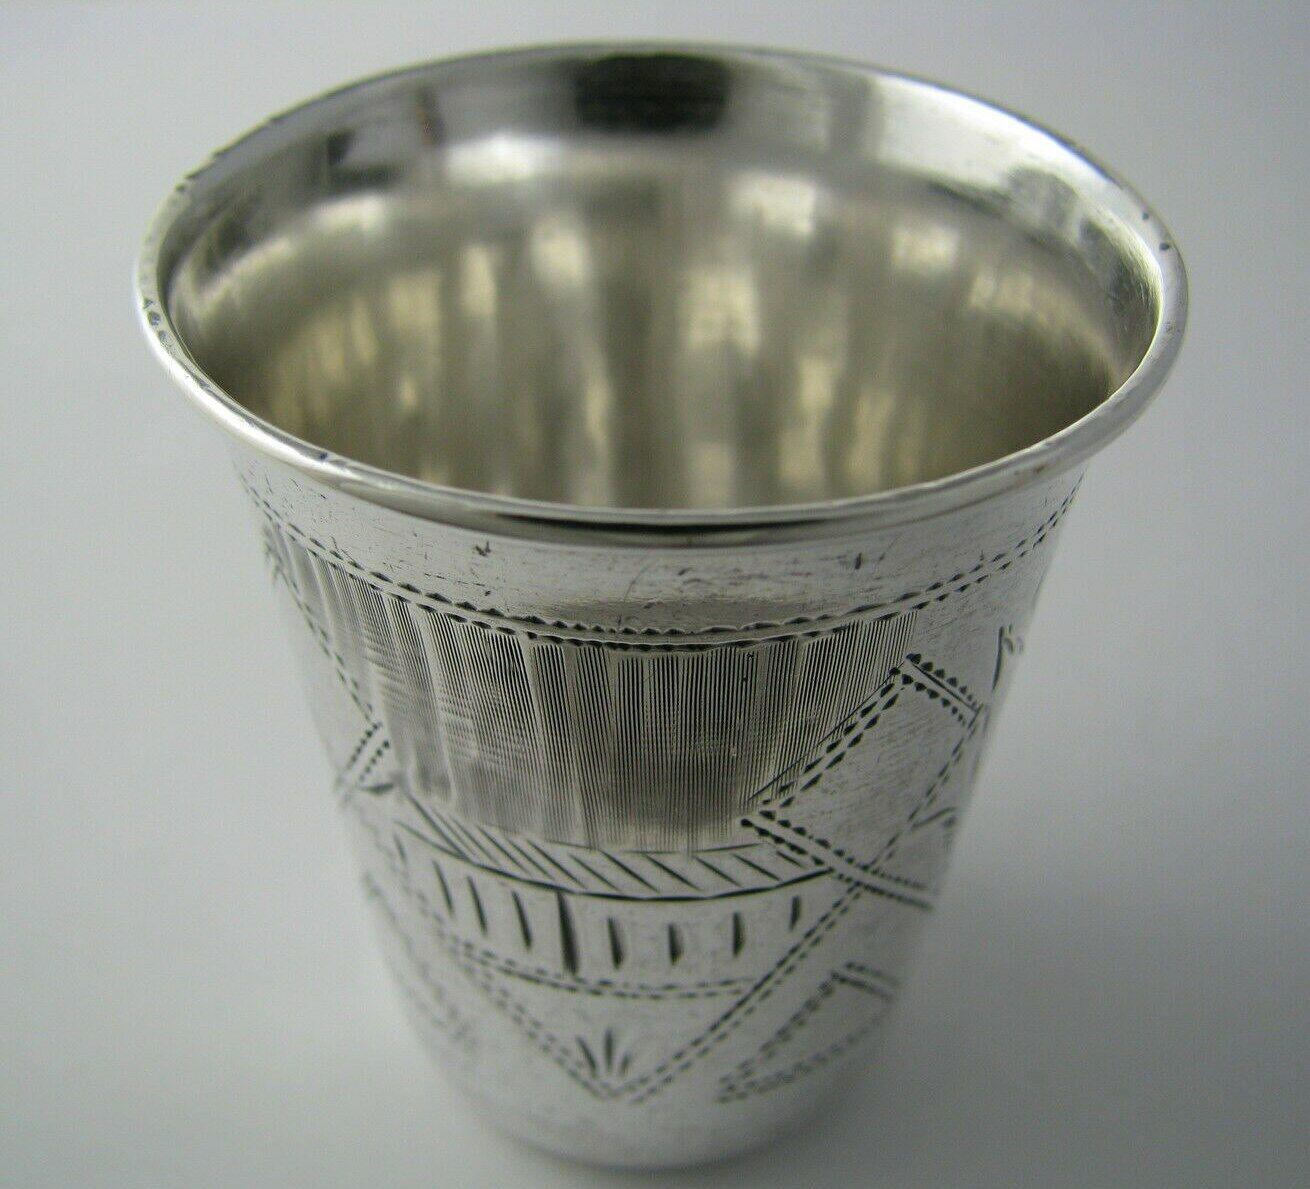 IMPERIAL RUSSIAN SILVER CUP KIDDUSH CUP VODKA CUP 84 Silver GR Russia Kiev C1899 - $145.00